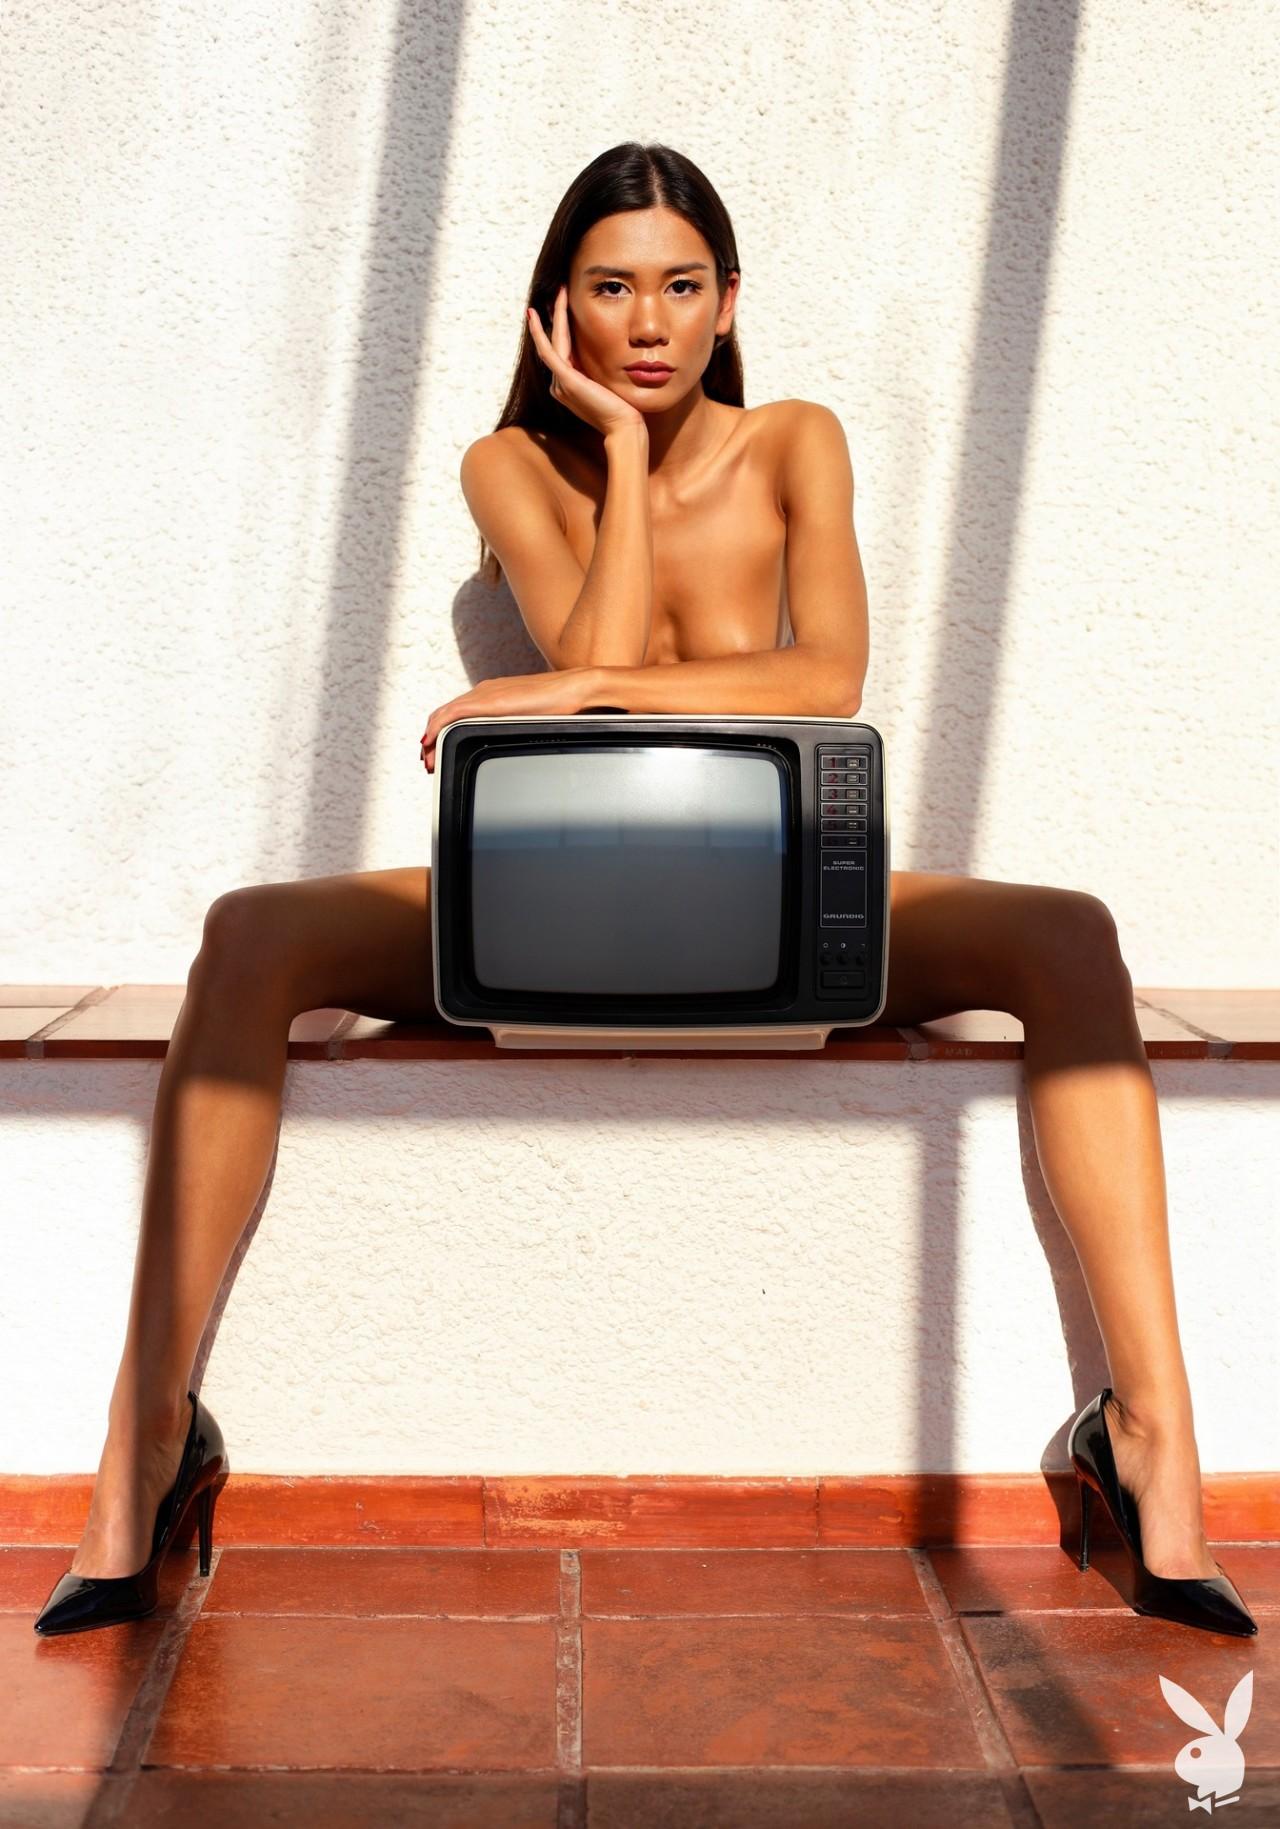 Cledia Fortin For Playboy International